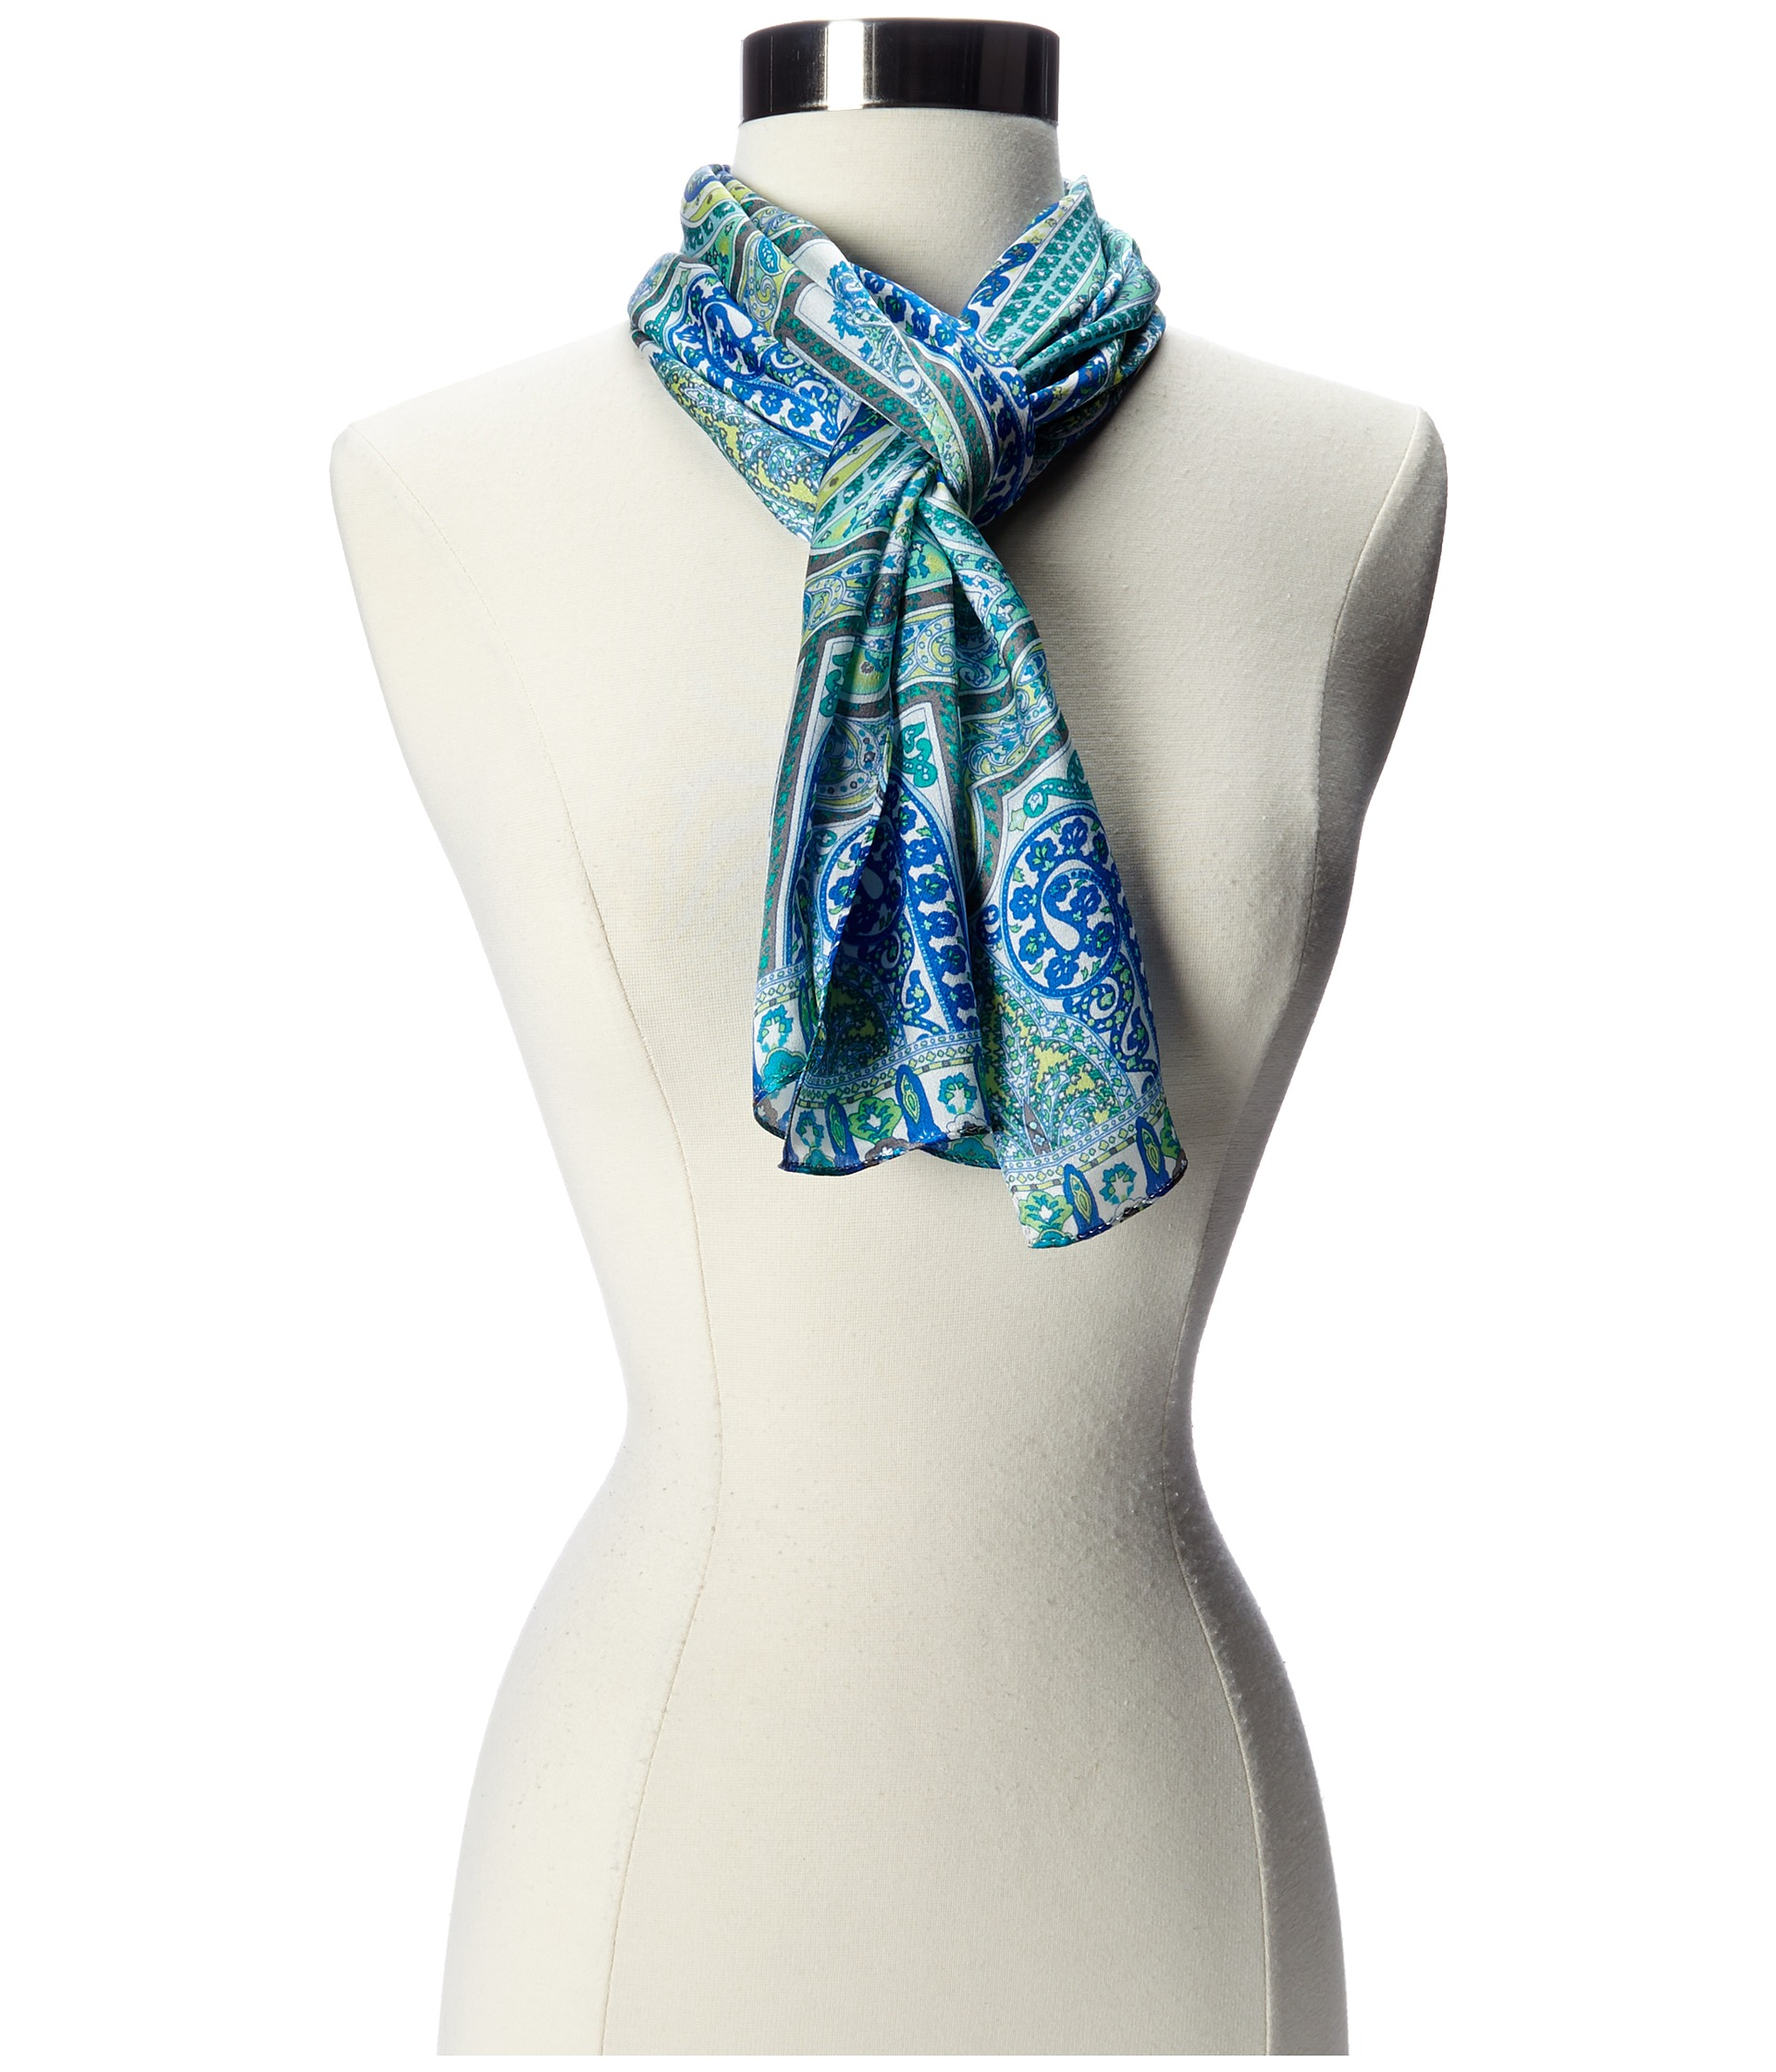 echo design swirled paisley scarf bright turquoise